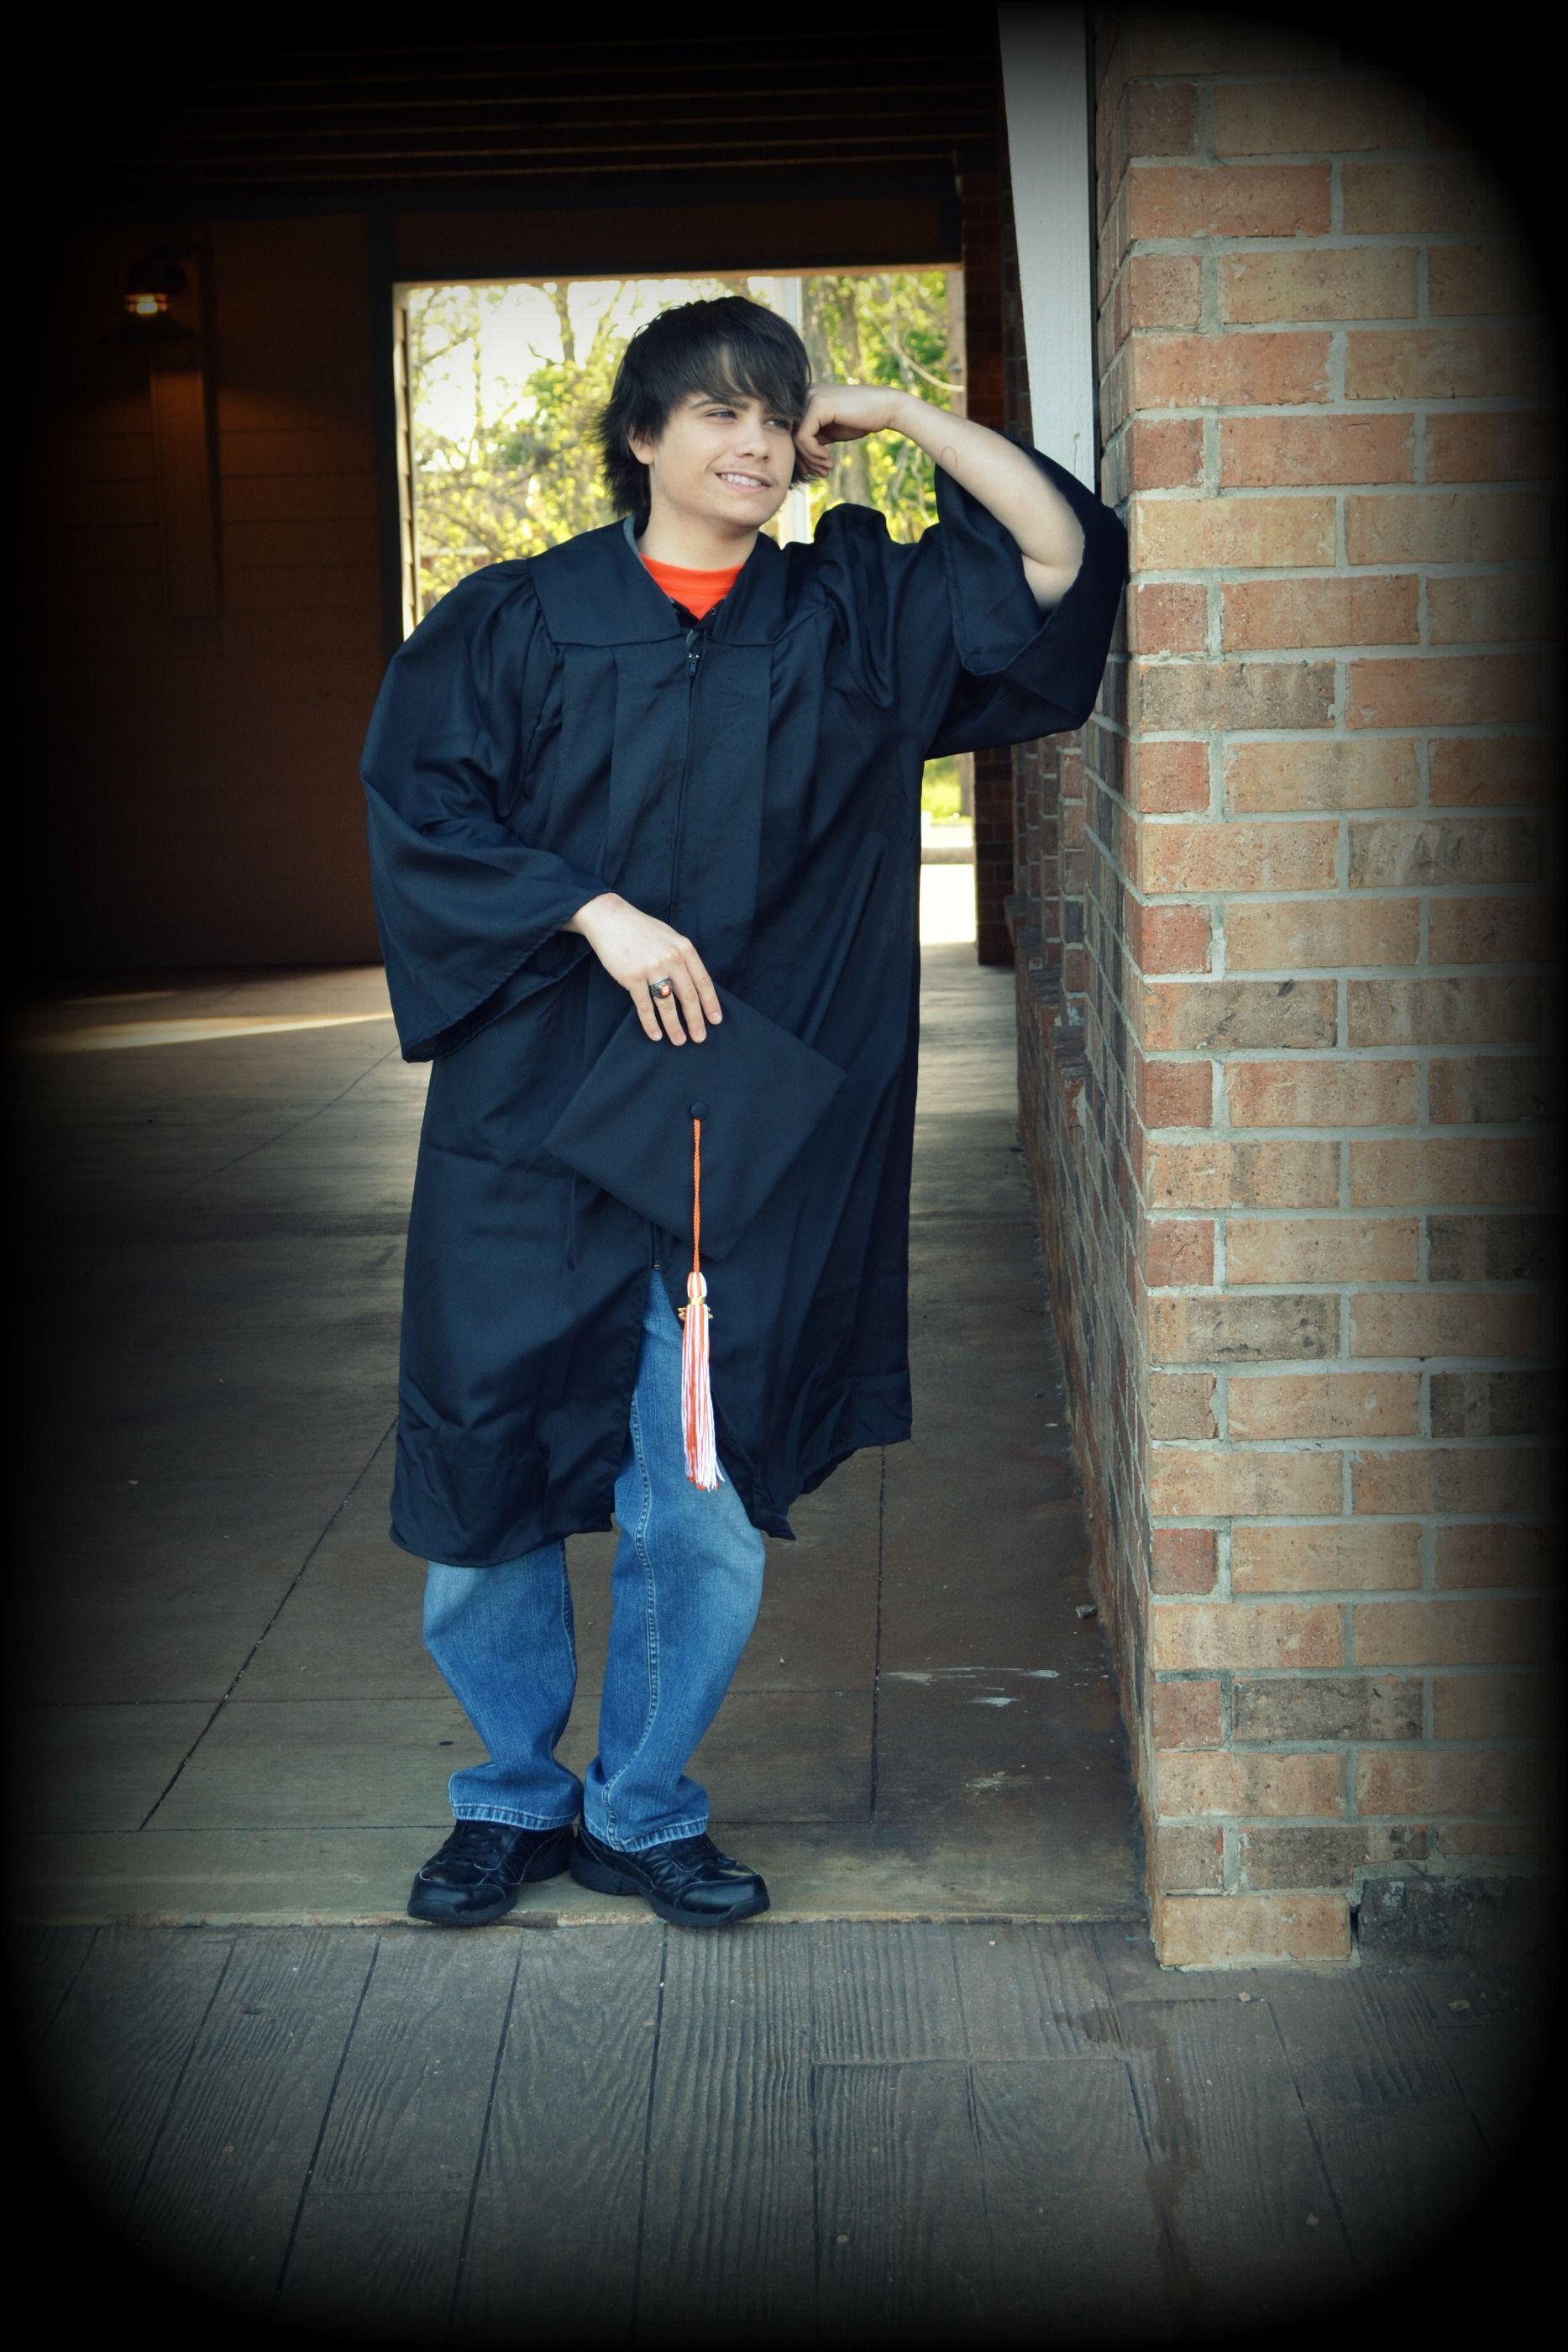 graduation #senior #ring #highschool #High school #guy #cap and ...